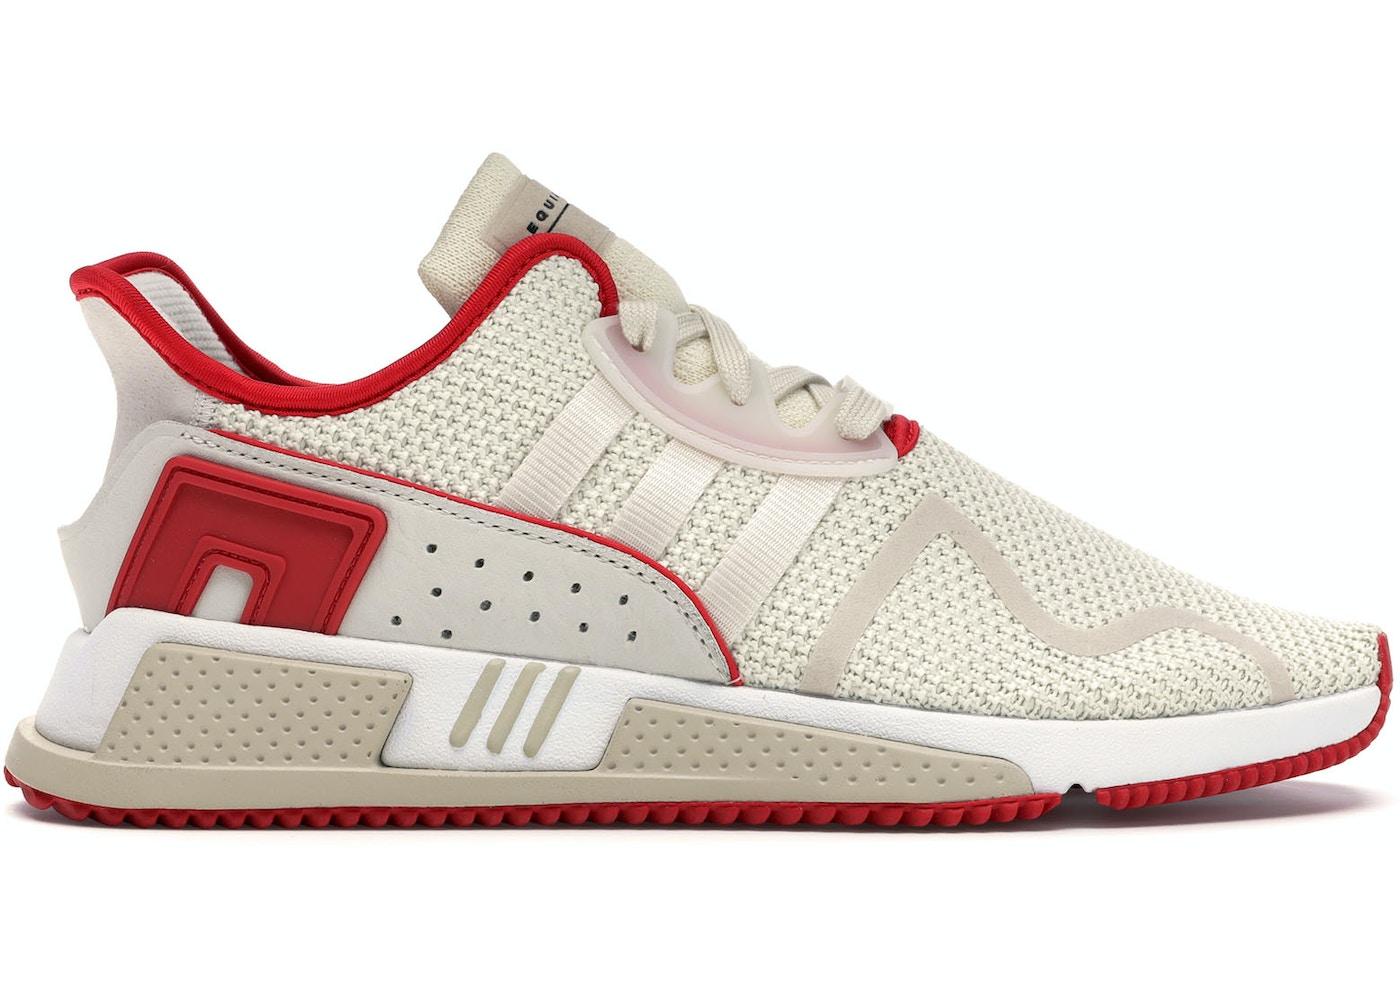 new products 5367e ae31a adidas EQT Cushion Adv Off White Clear Brown Scarlet